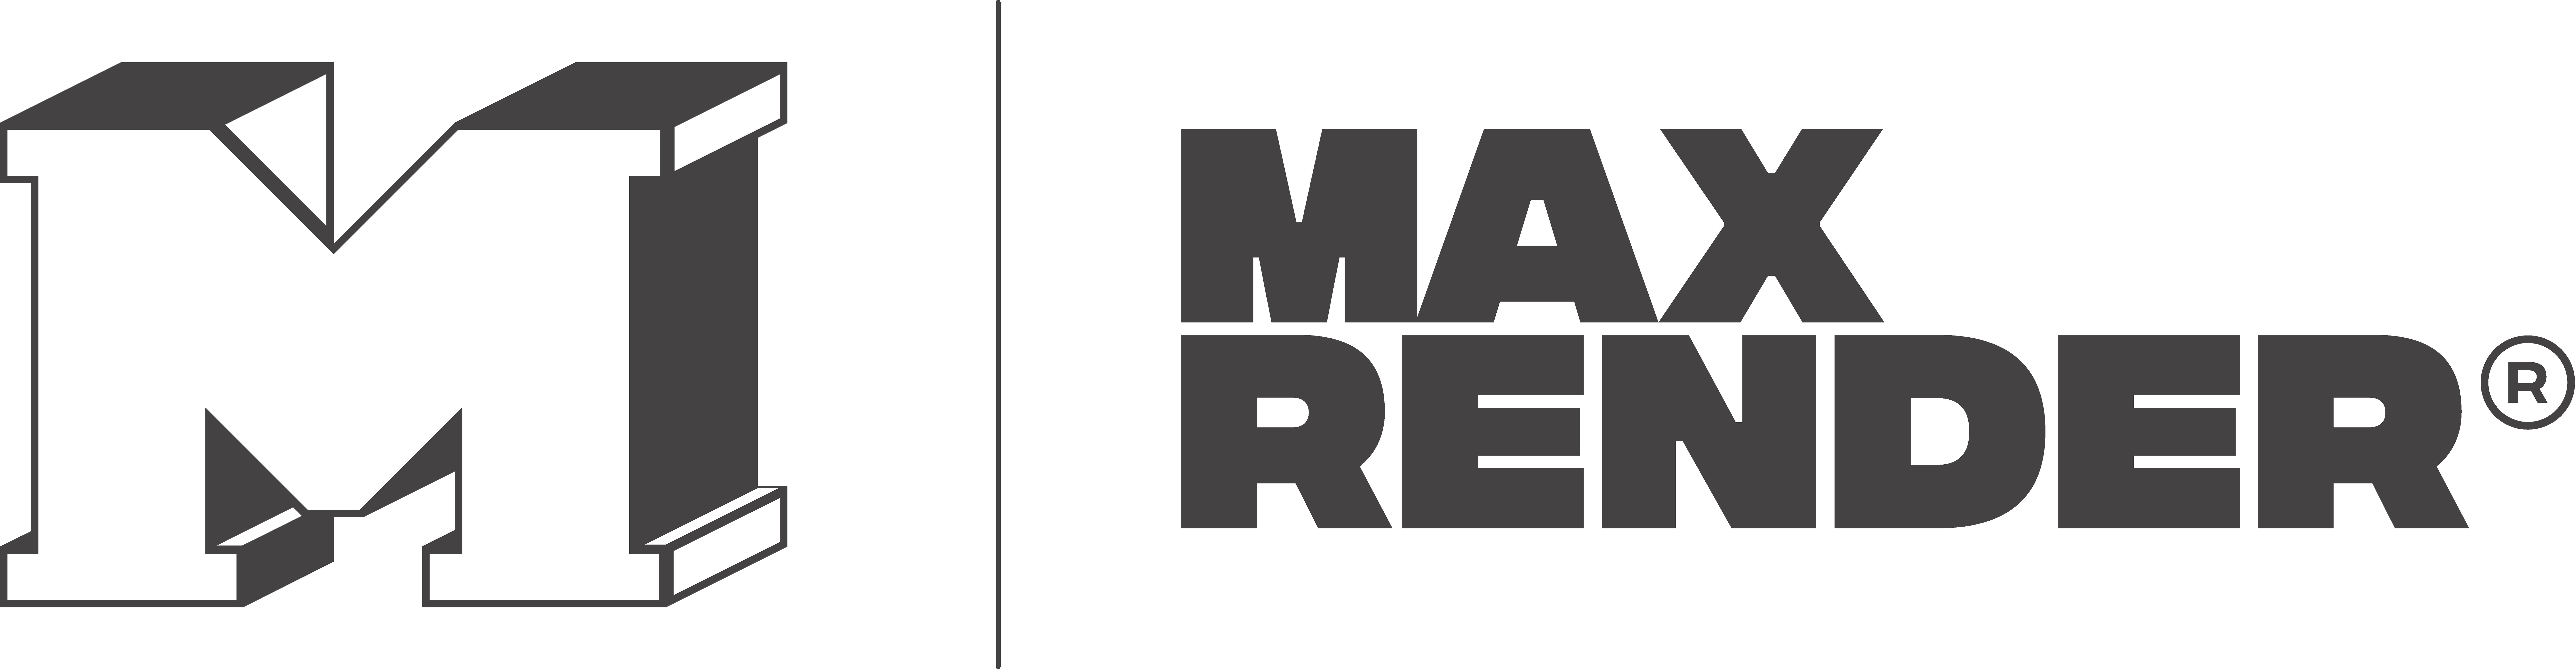 logomarca MaxRender black